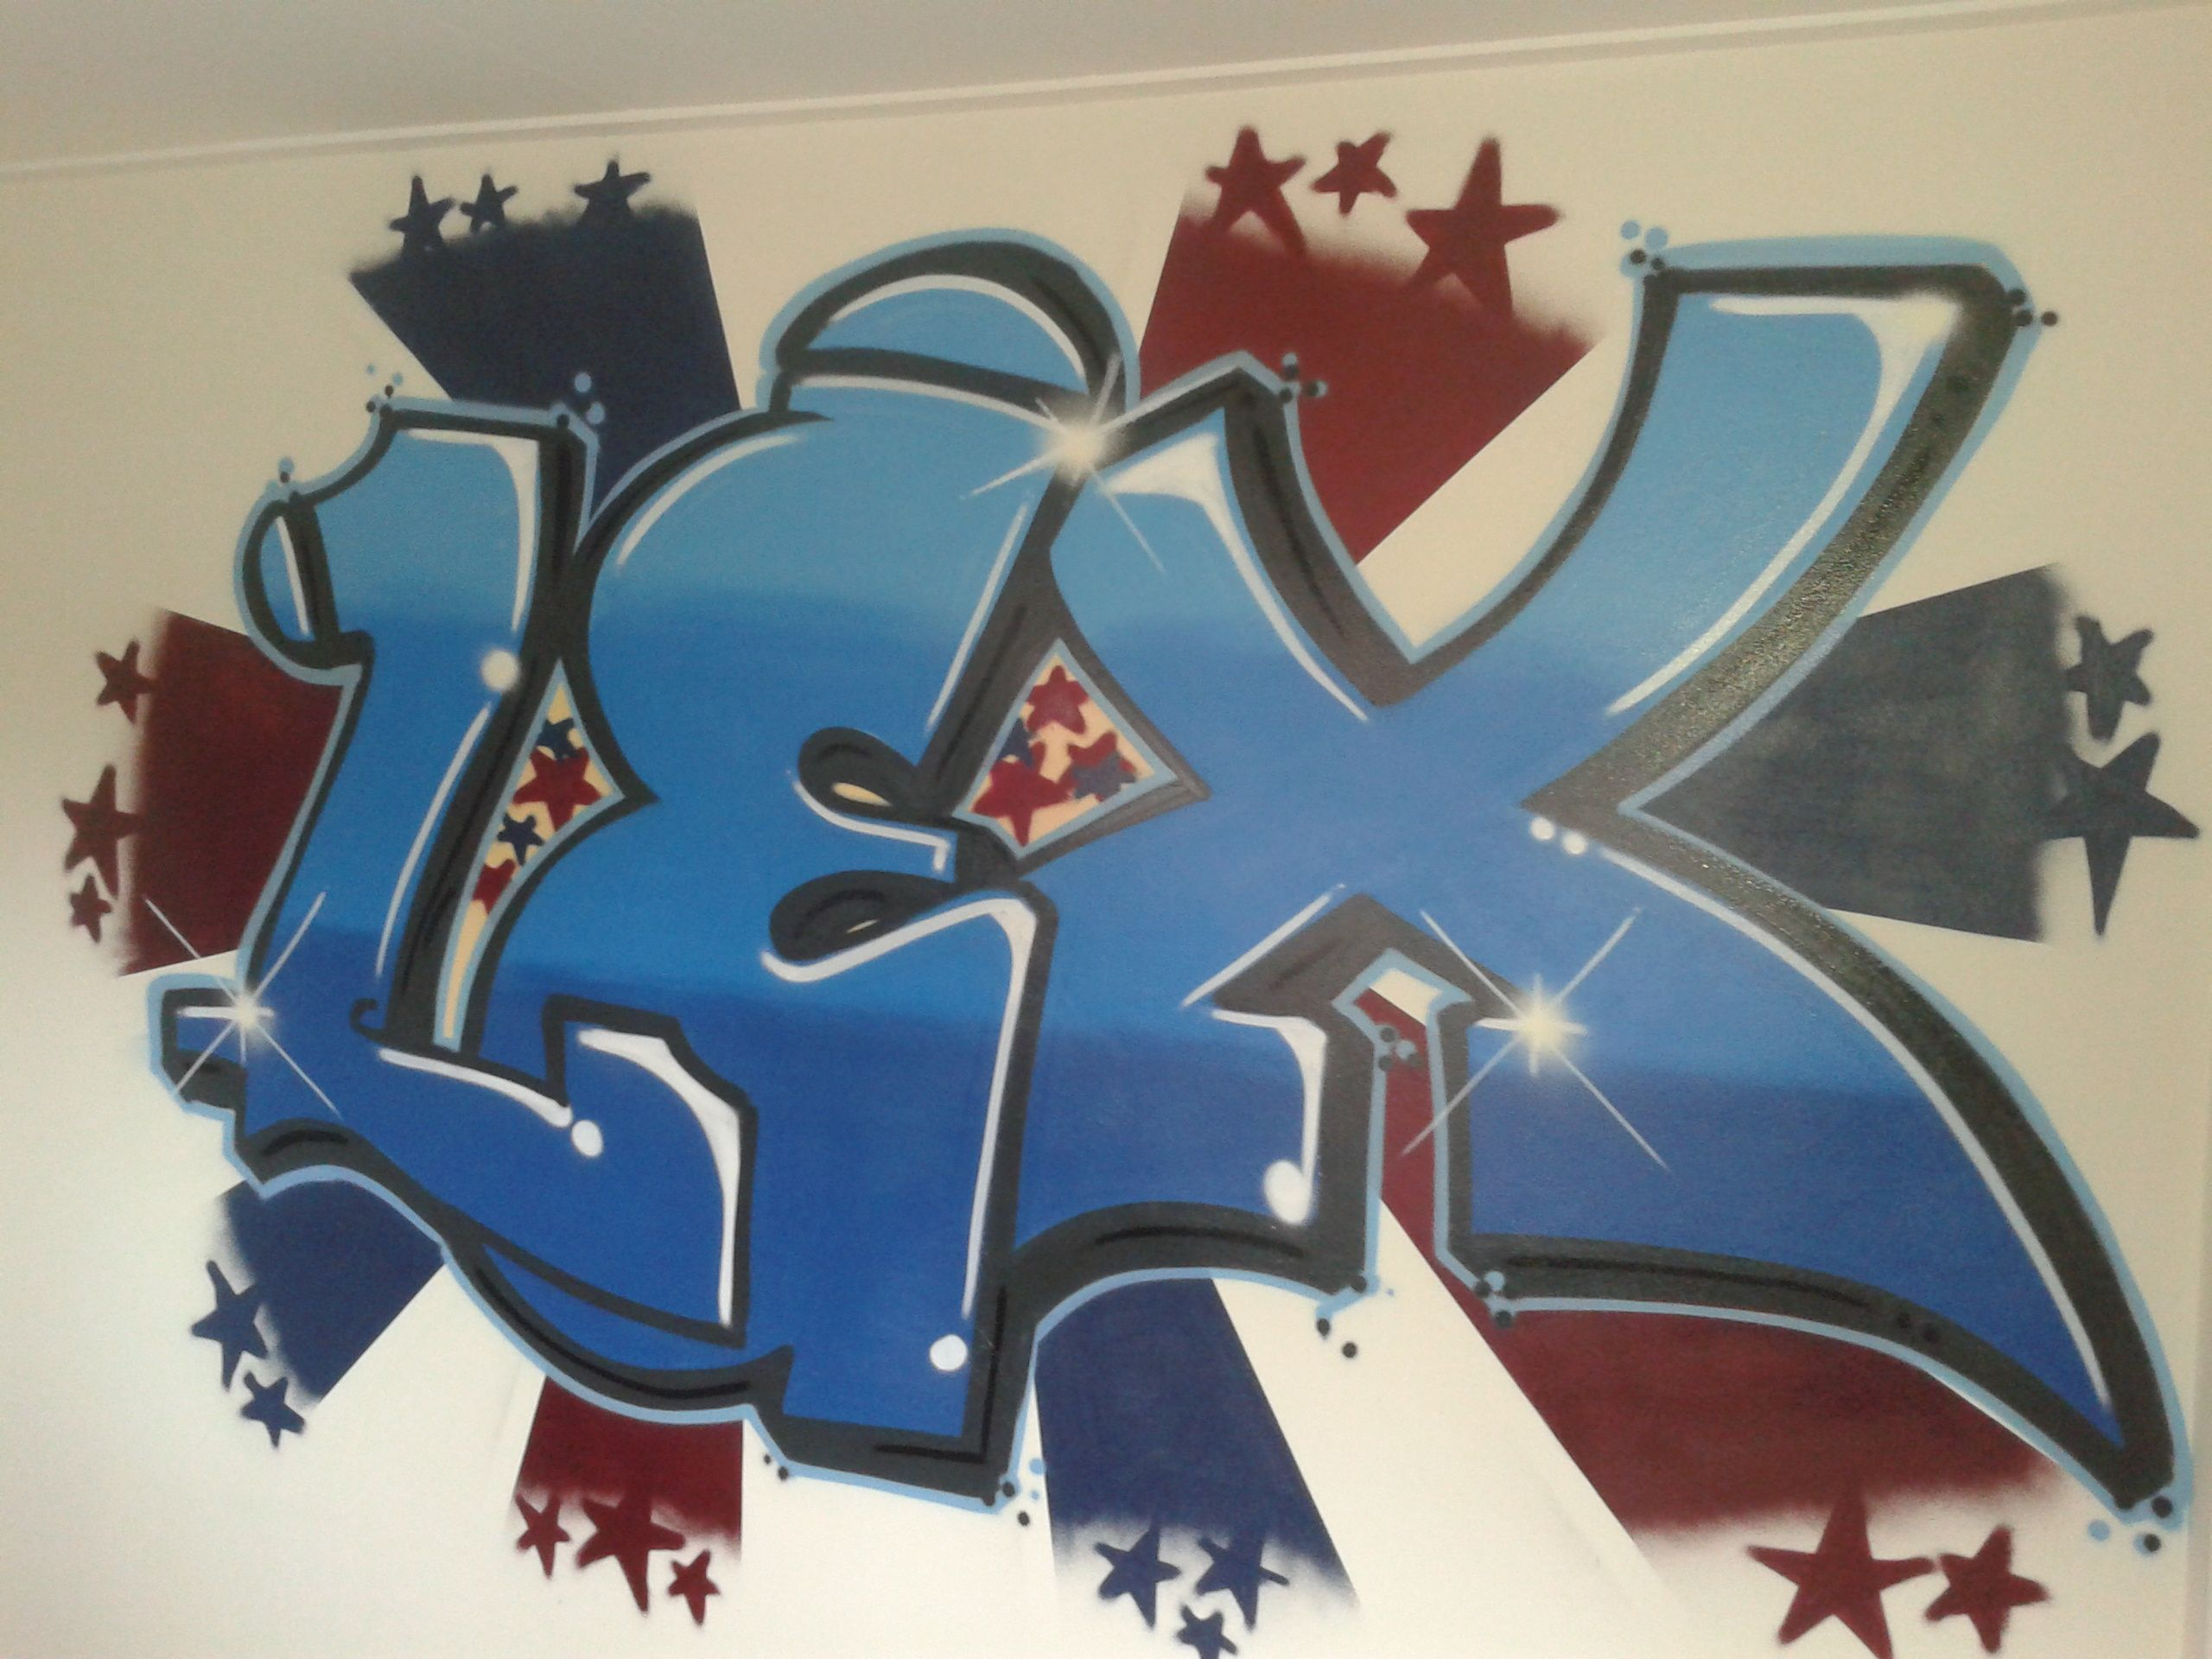 Graffiti Slaapkamer Muur : Muur archieven mr graffiti